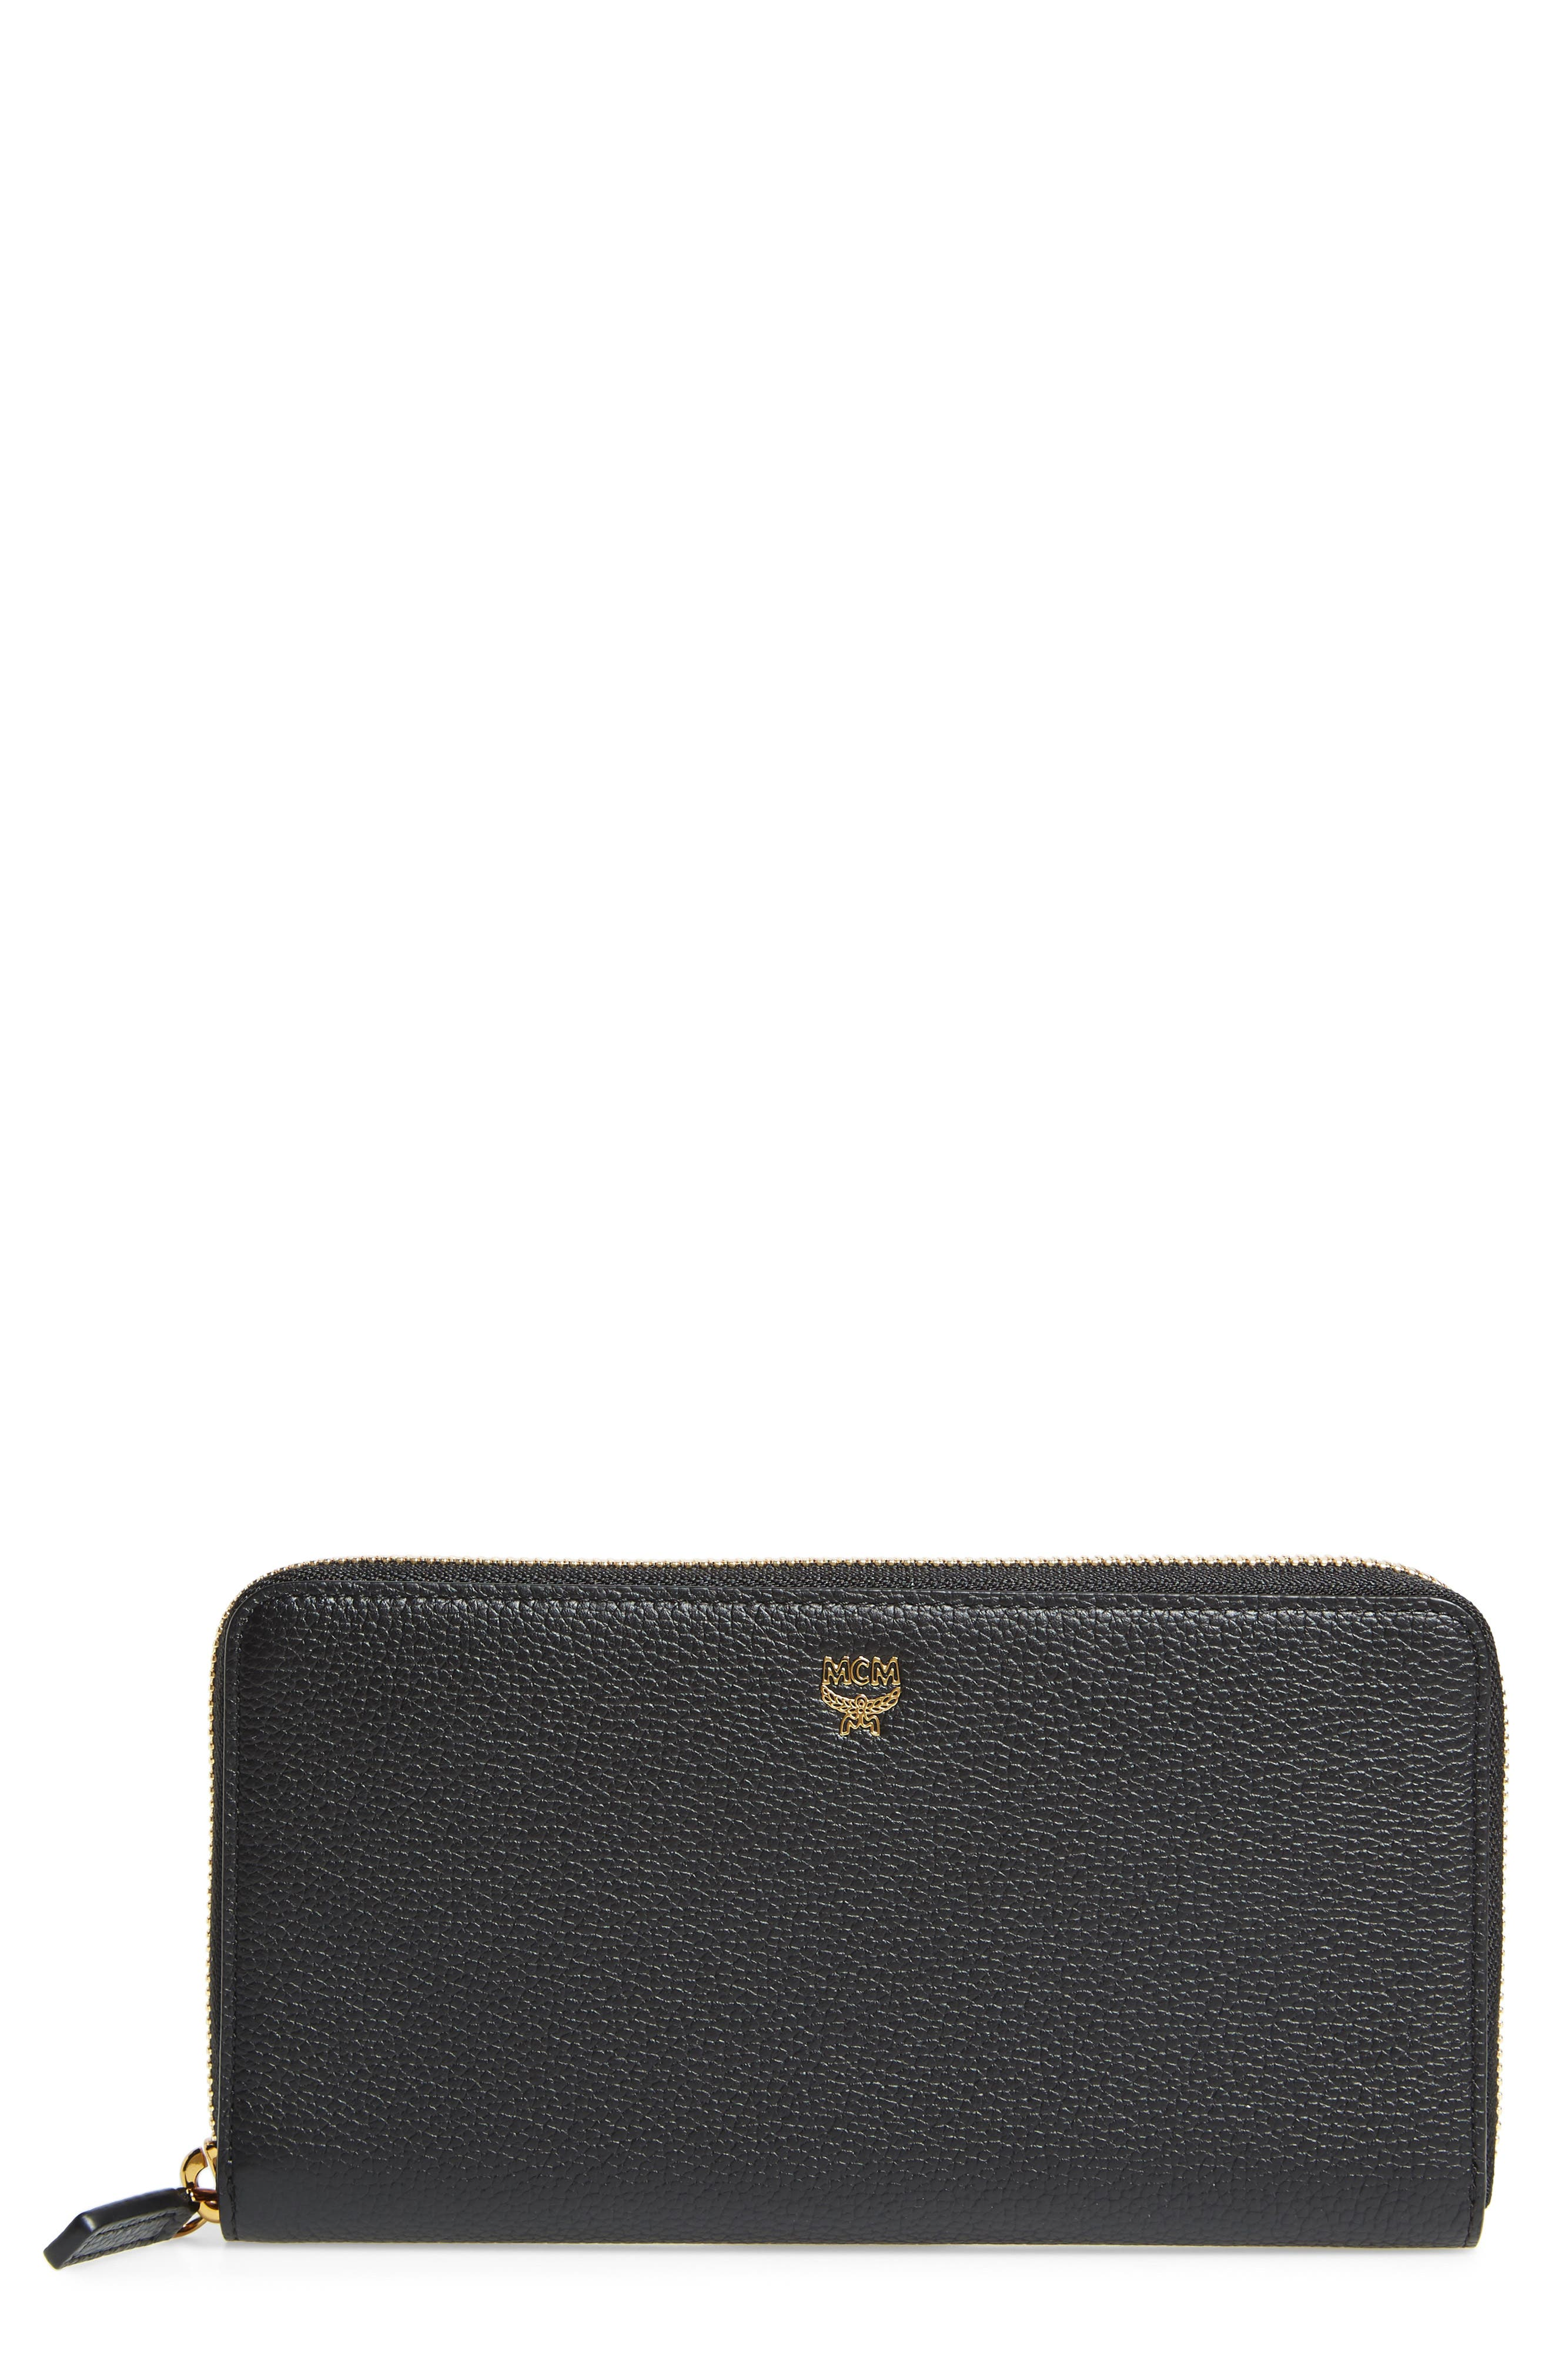 Alternate Image 1 Selected - MCM Large Milla Zip-Around Leather Wallet